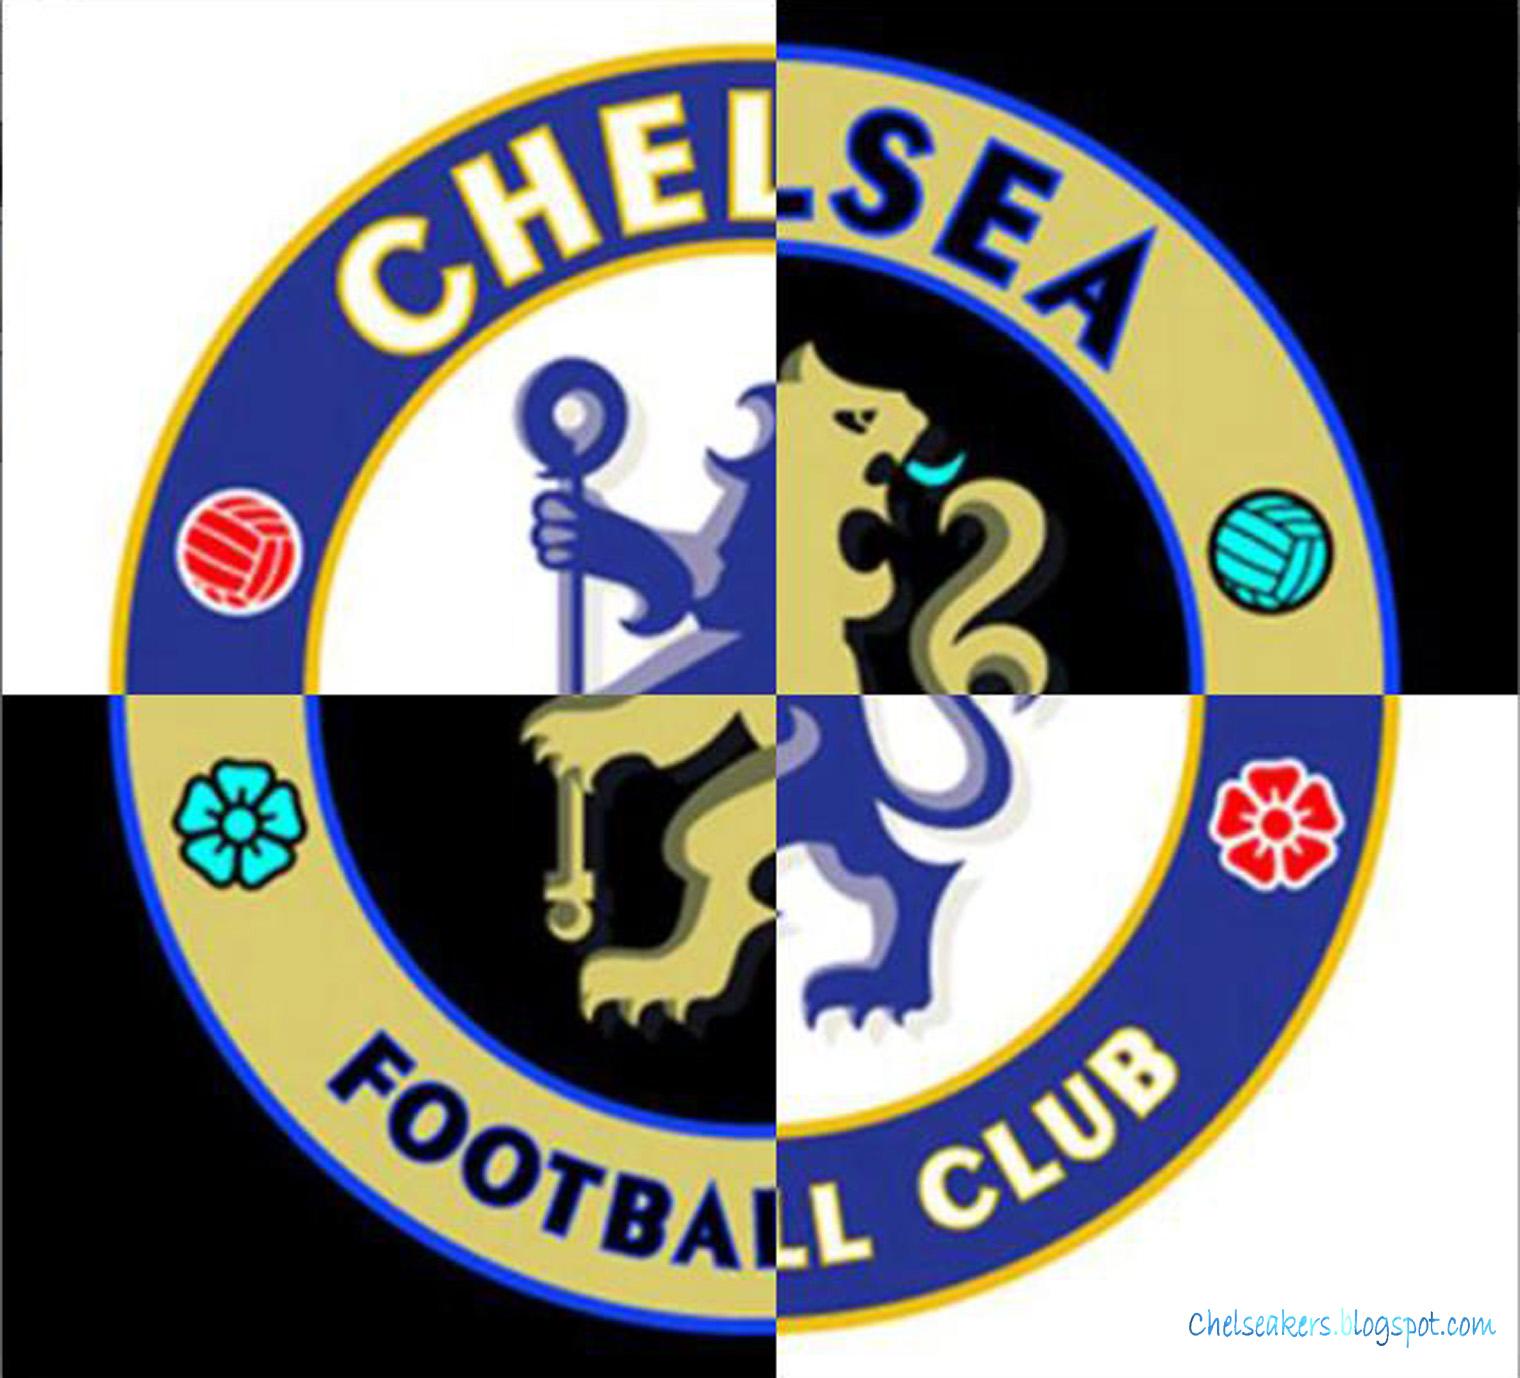 Chelsea 2013Chelsea Wallpaper Wallpaper Sport 22284 high quality 1520x1378